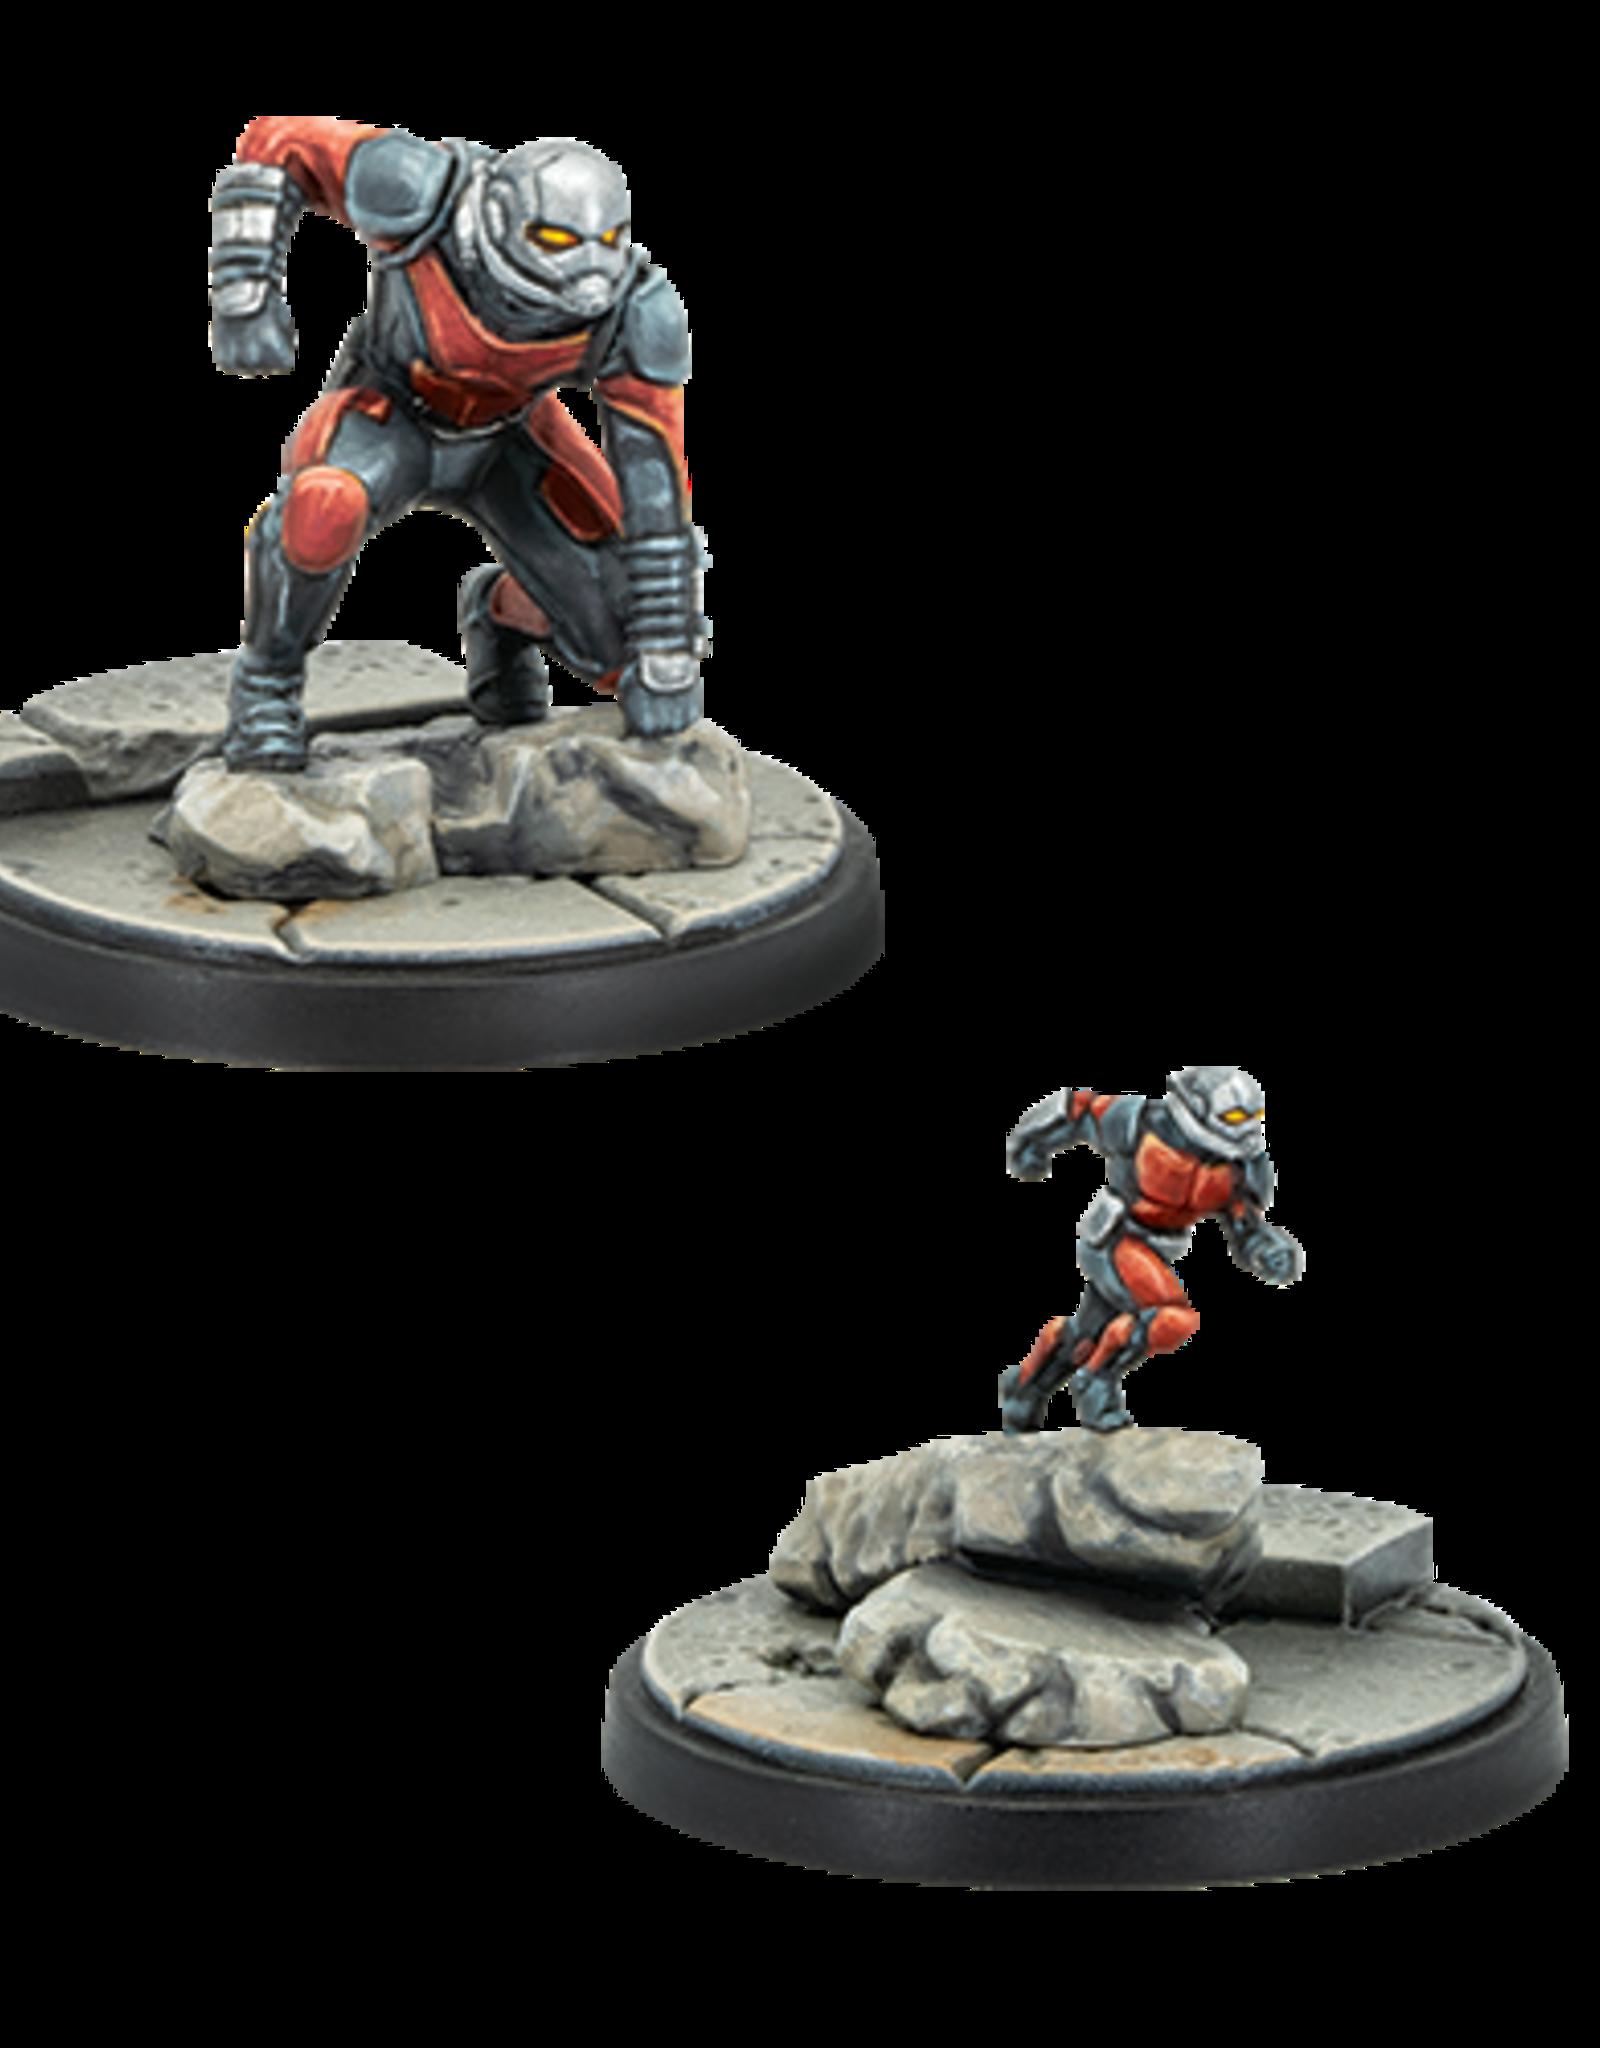 Atomic Mass Marvel Crisis Protocol Ant-Man and Wasp